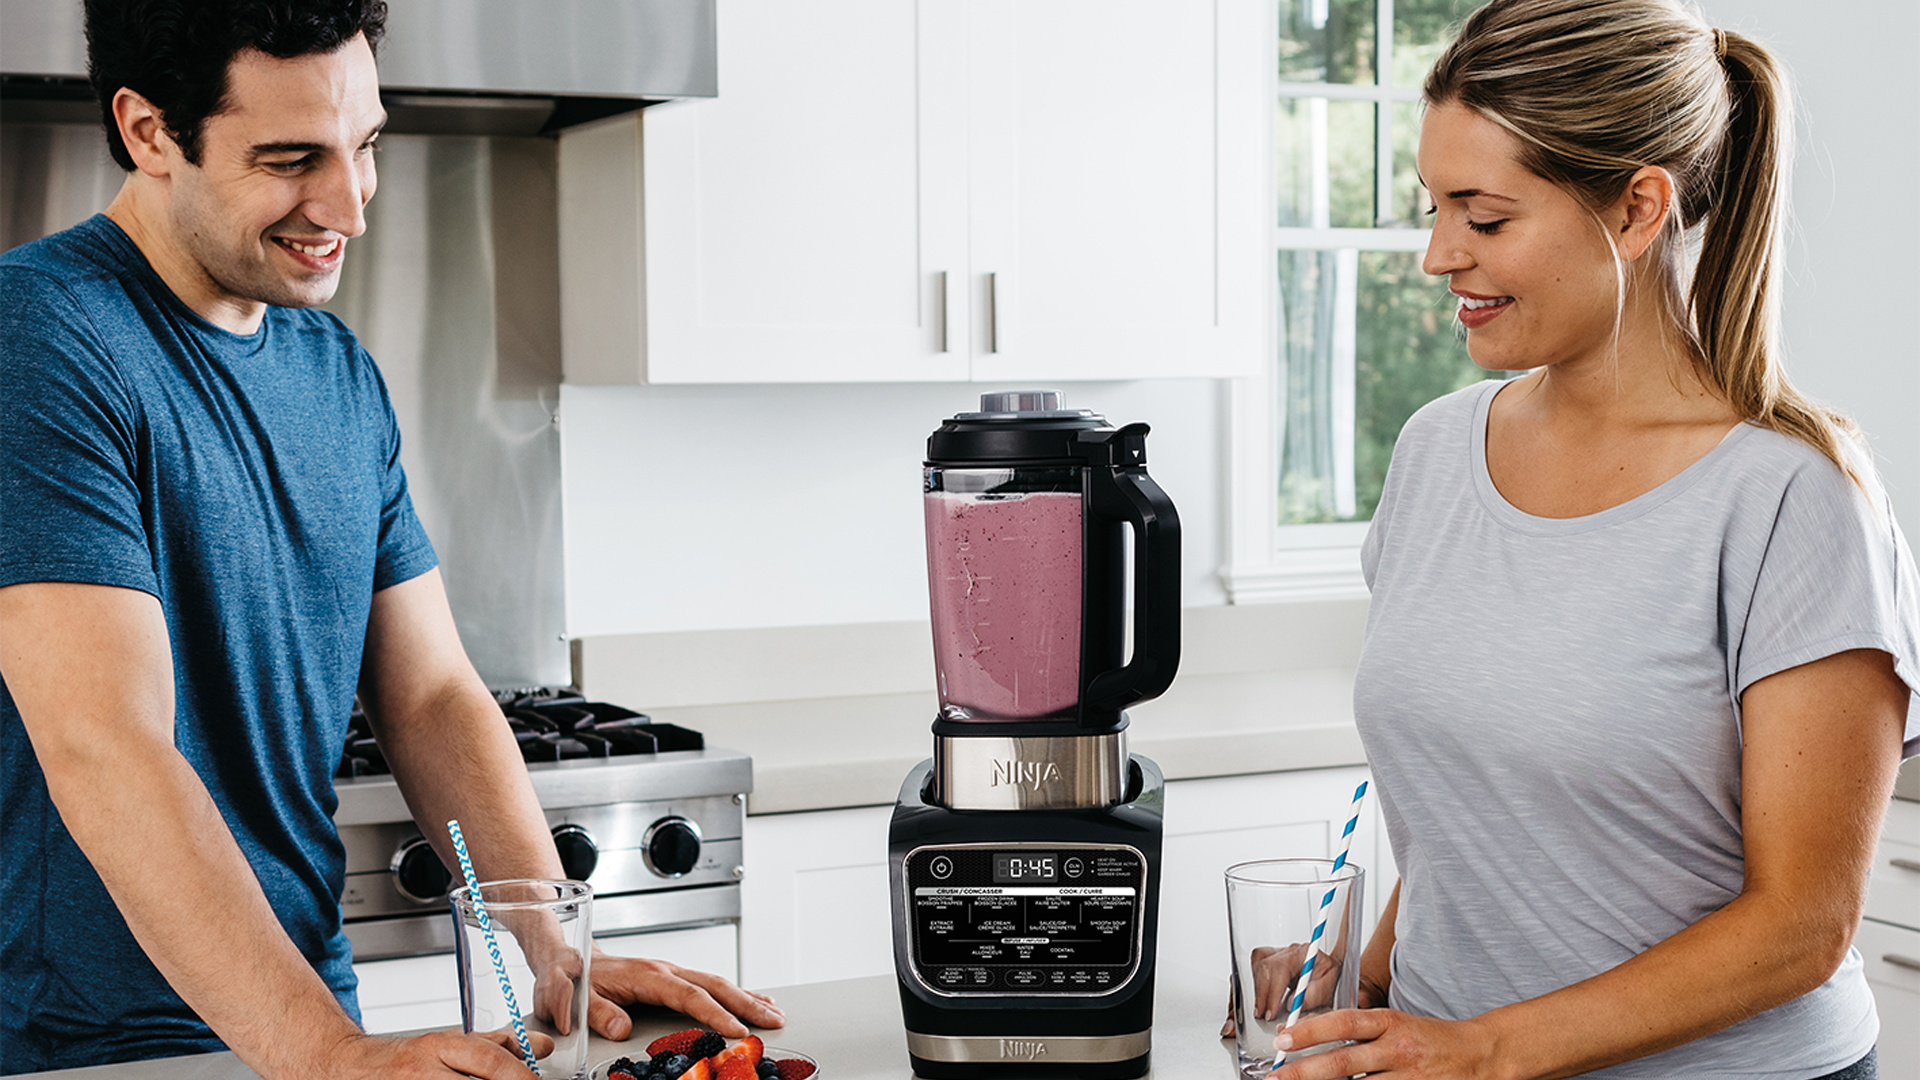 Ninja Foodi hot and cold blender review and recipe